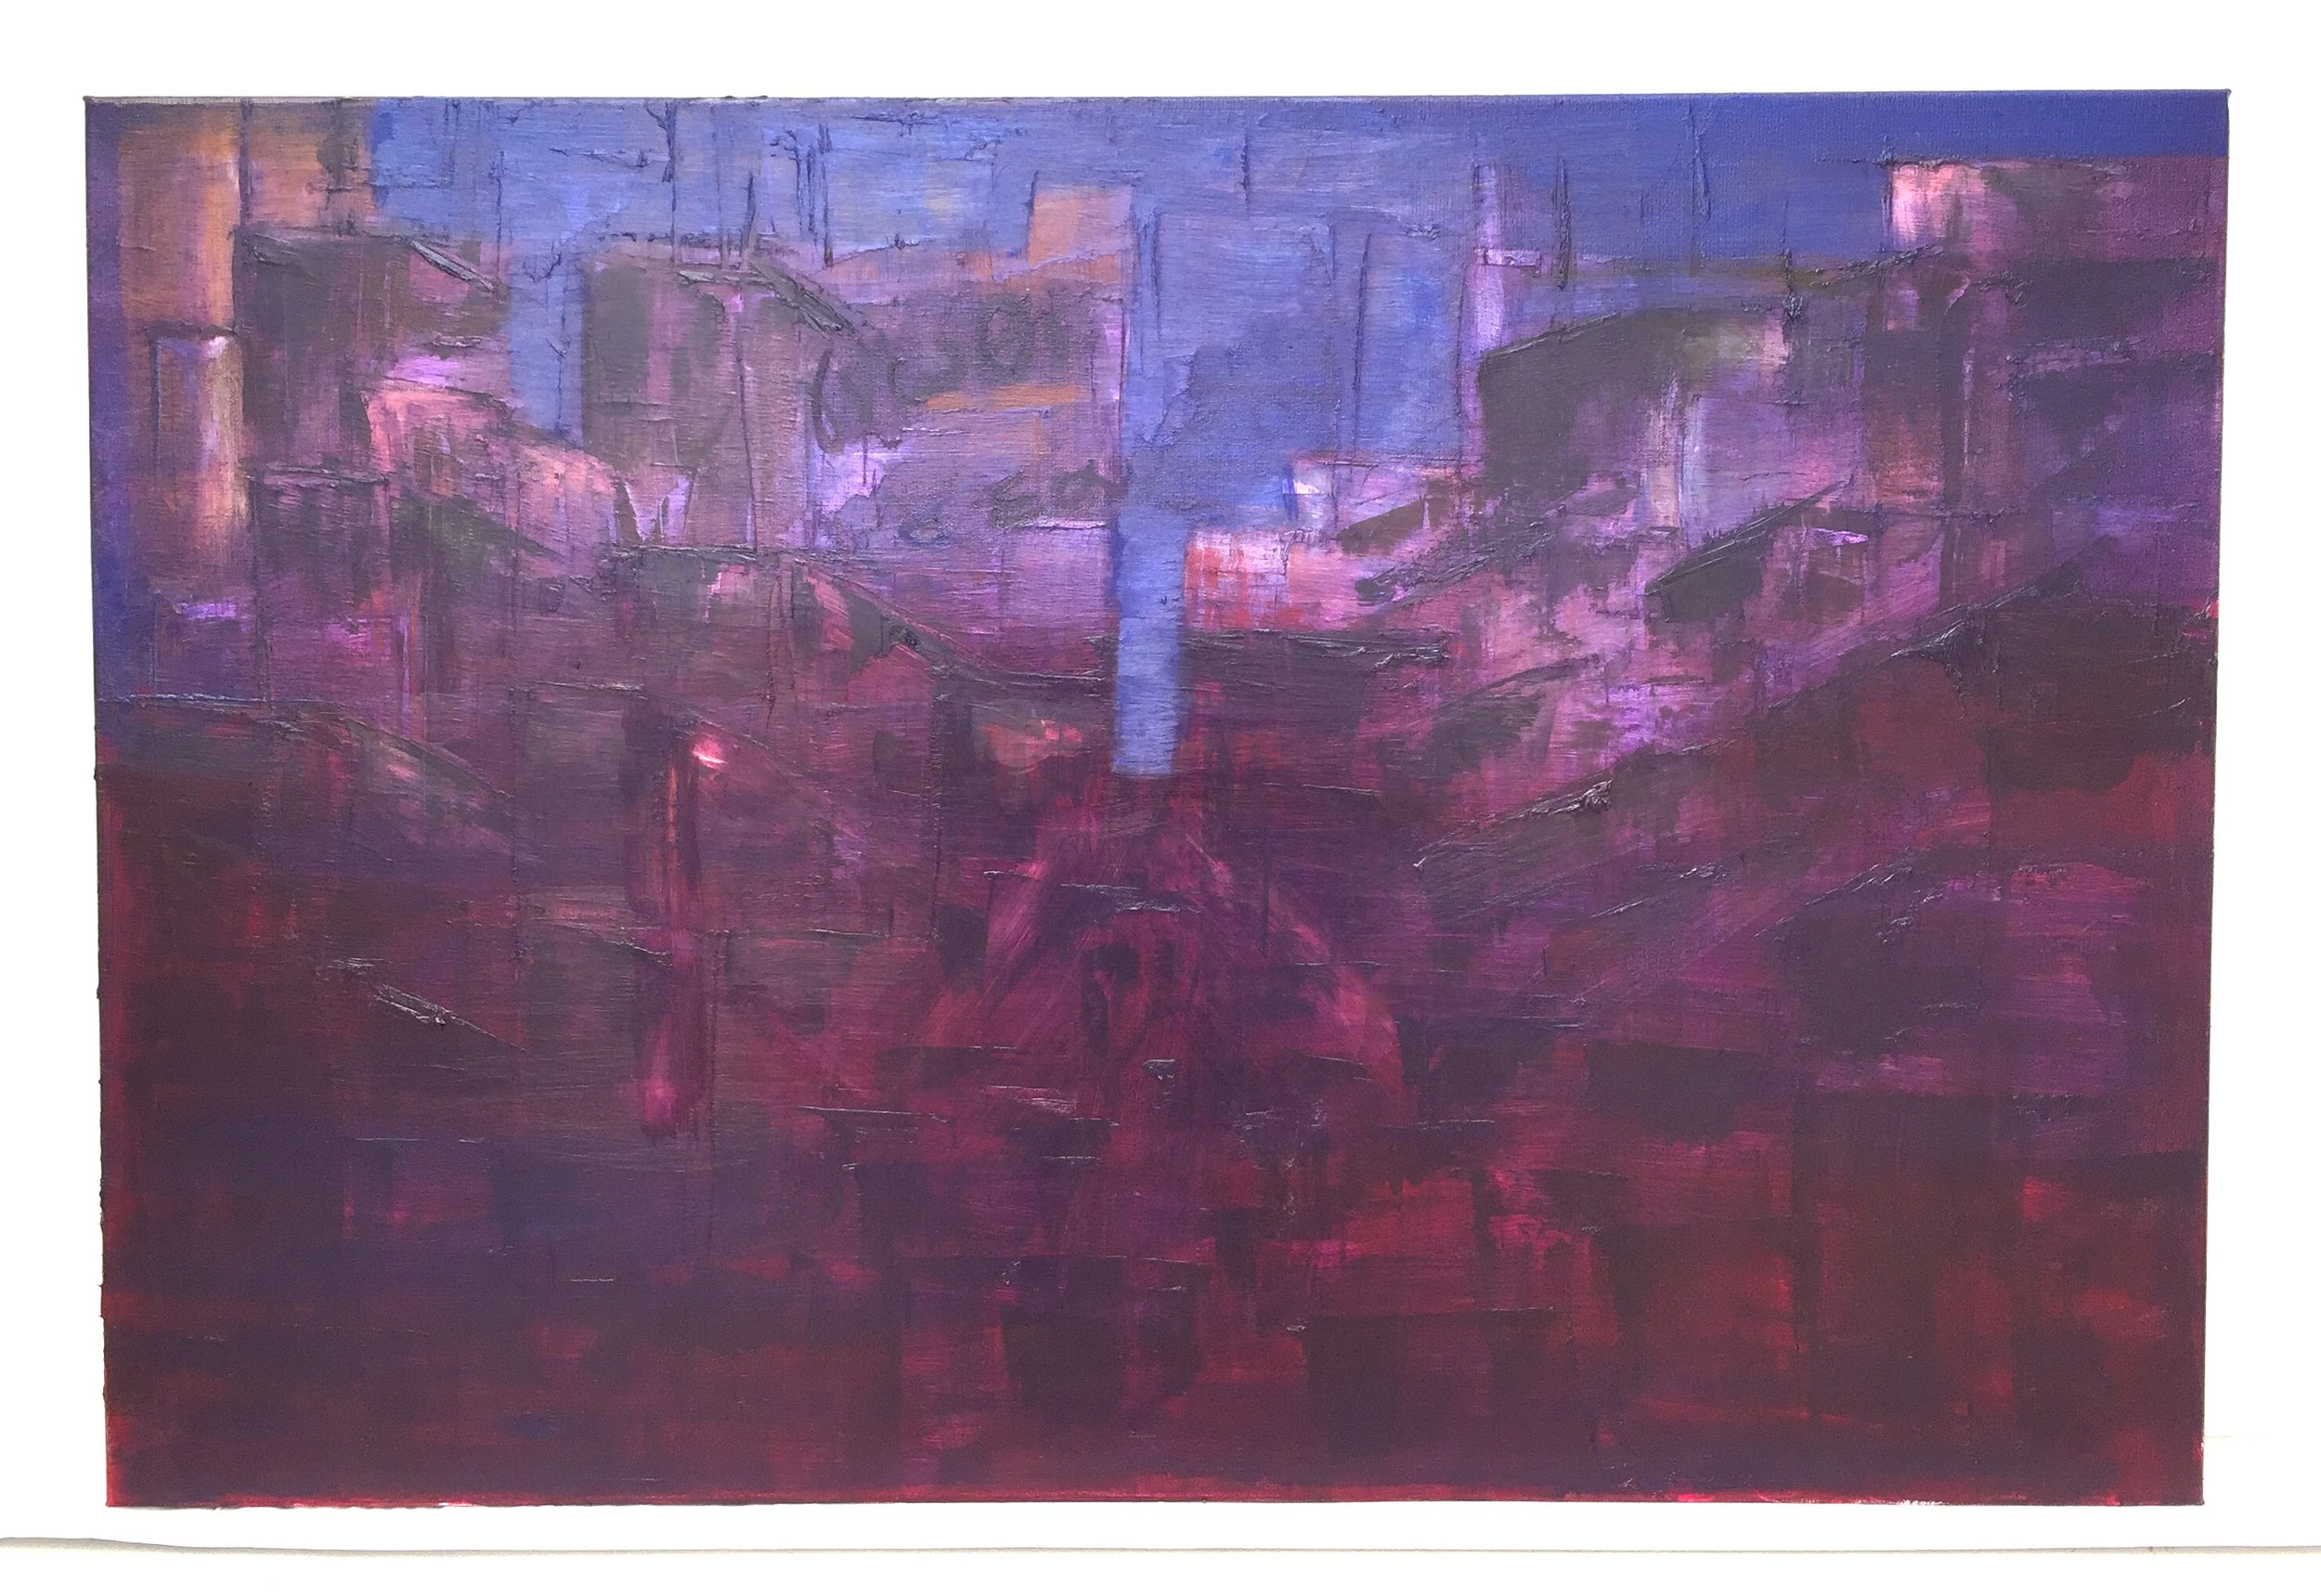 Purple (prijs: € 850)